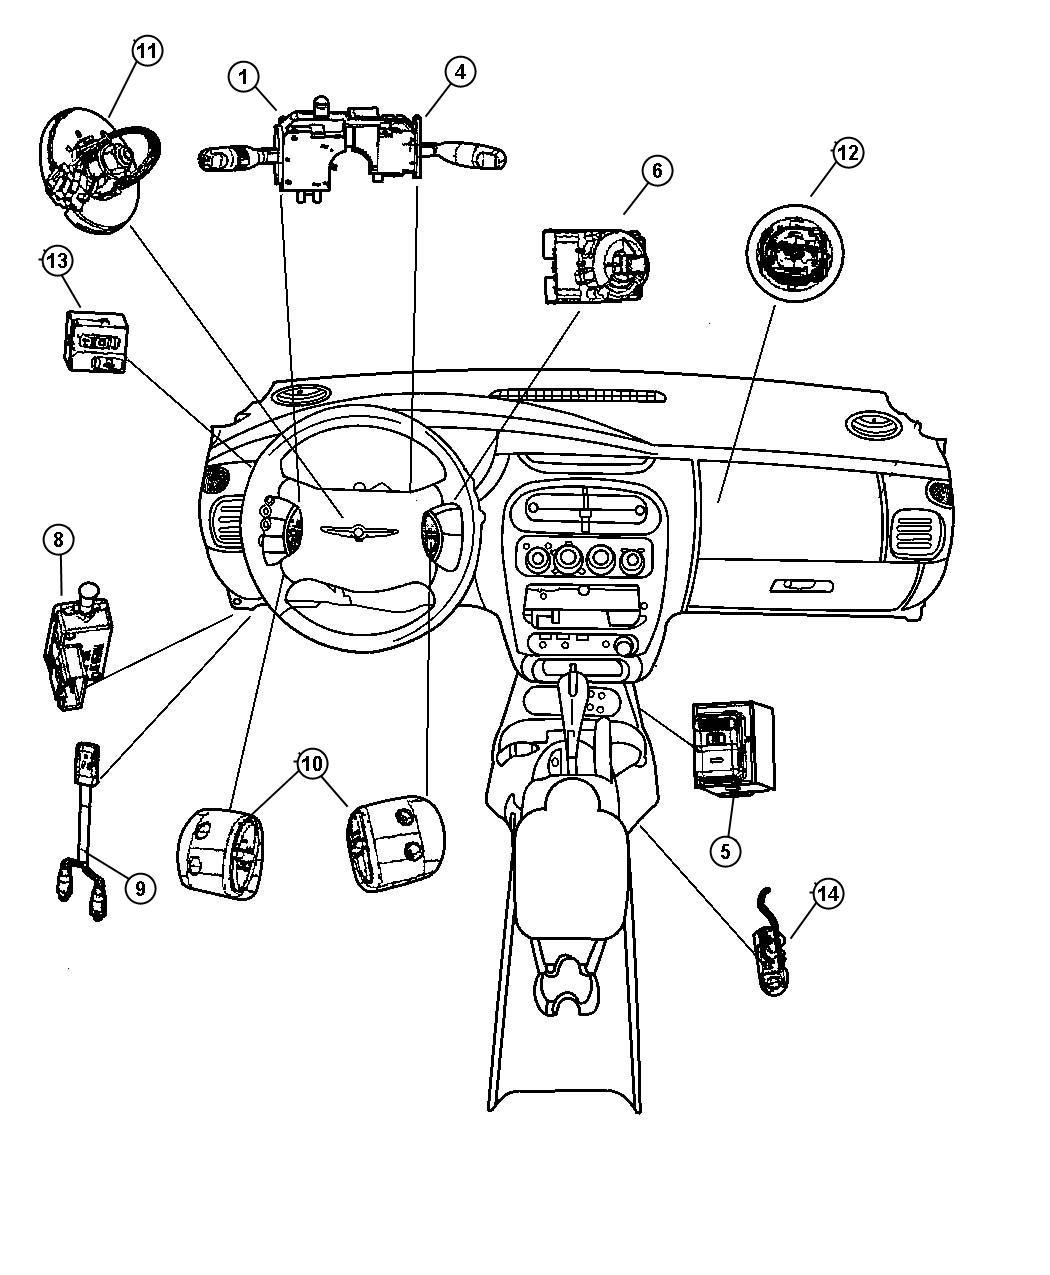 Dodge Neon Switch Ignition Column Steering Tilt